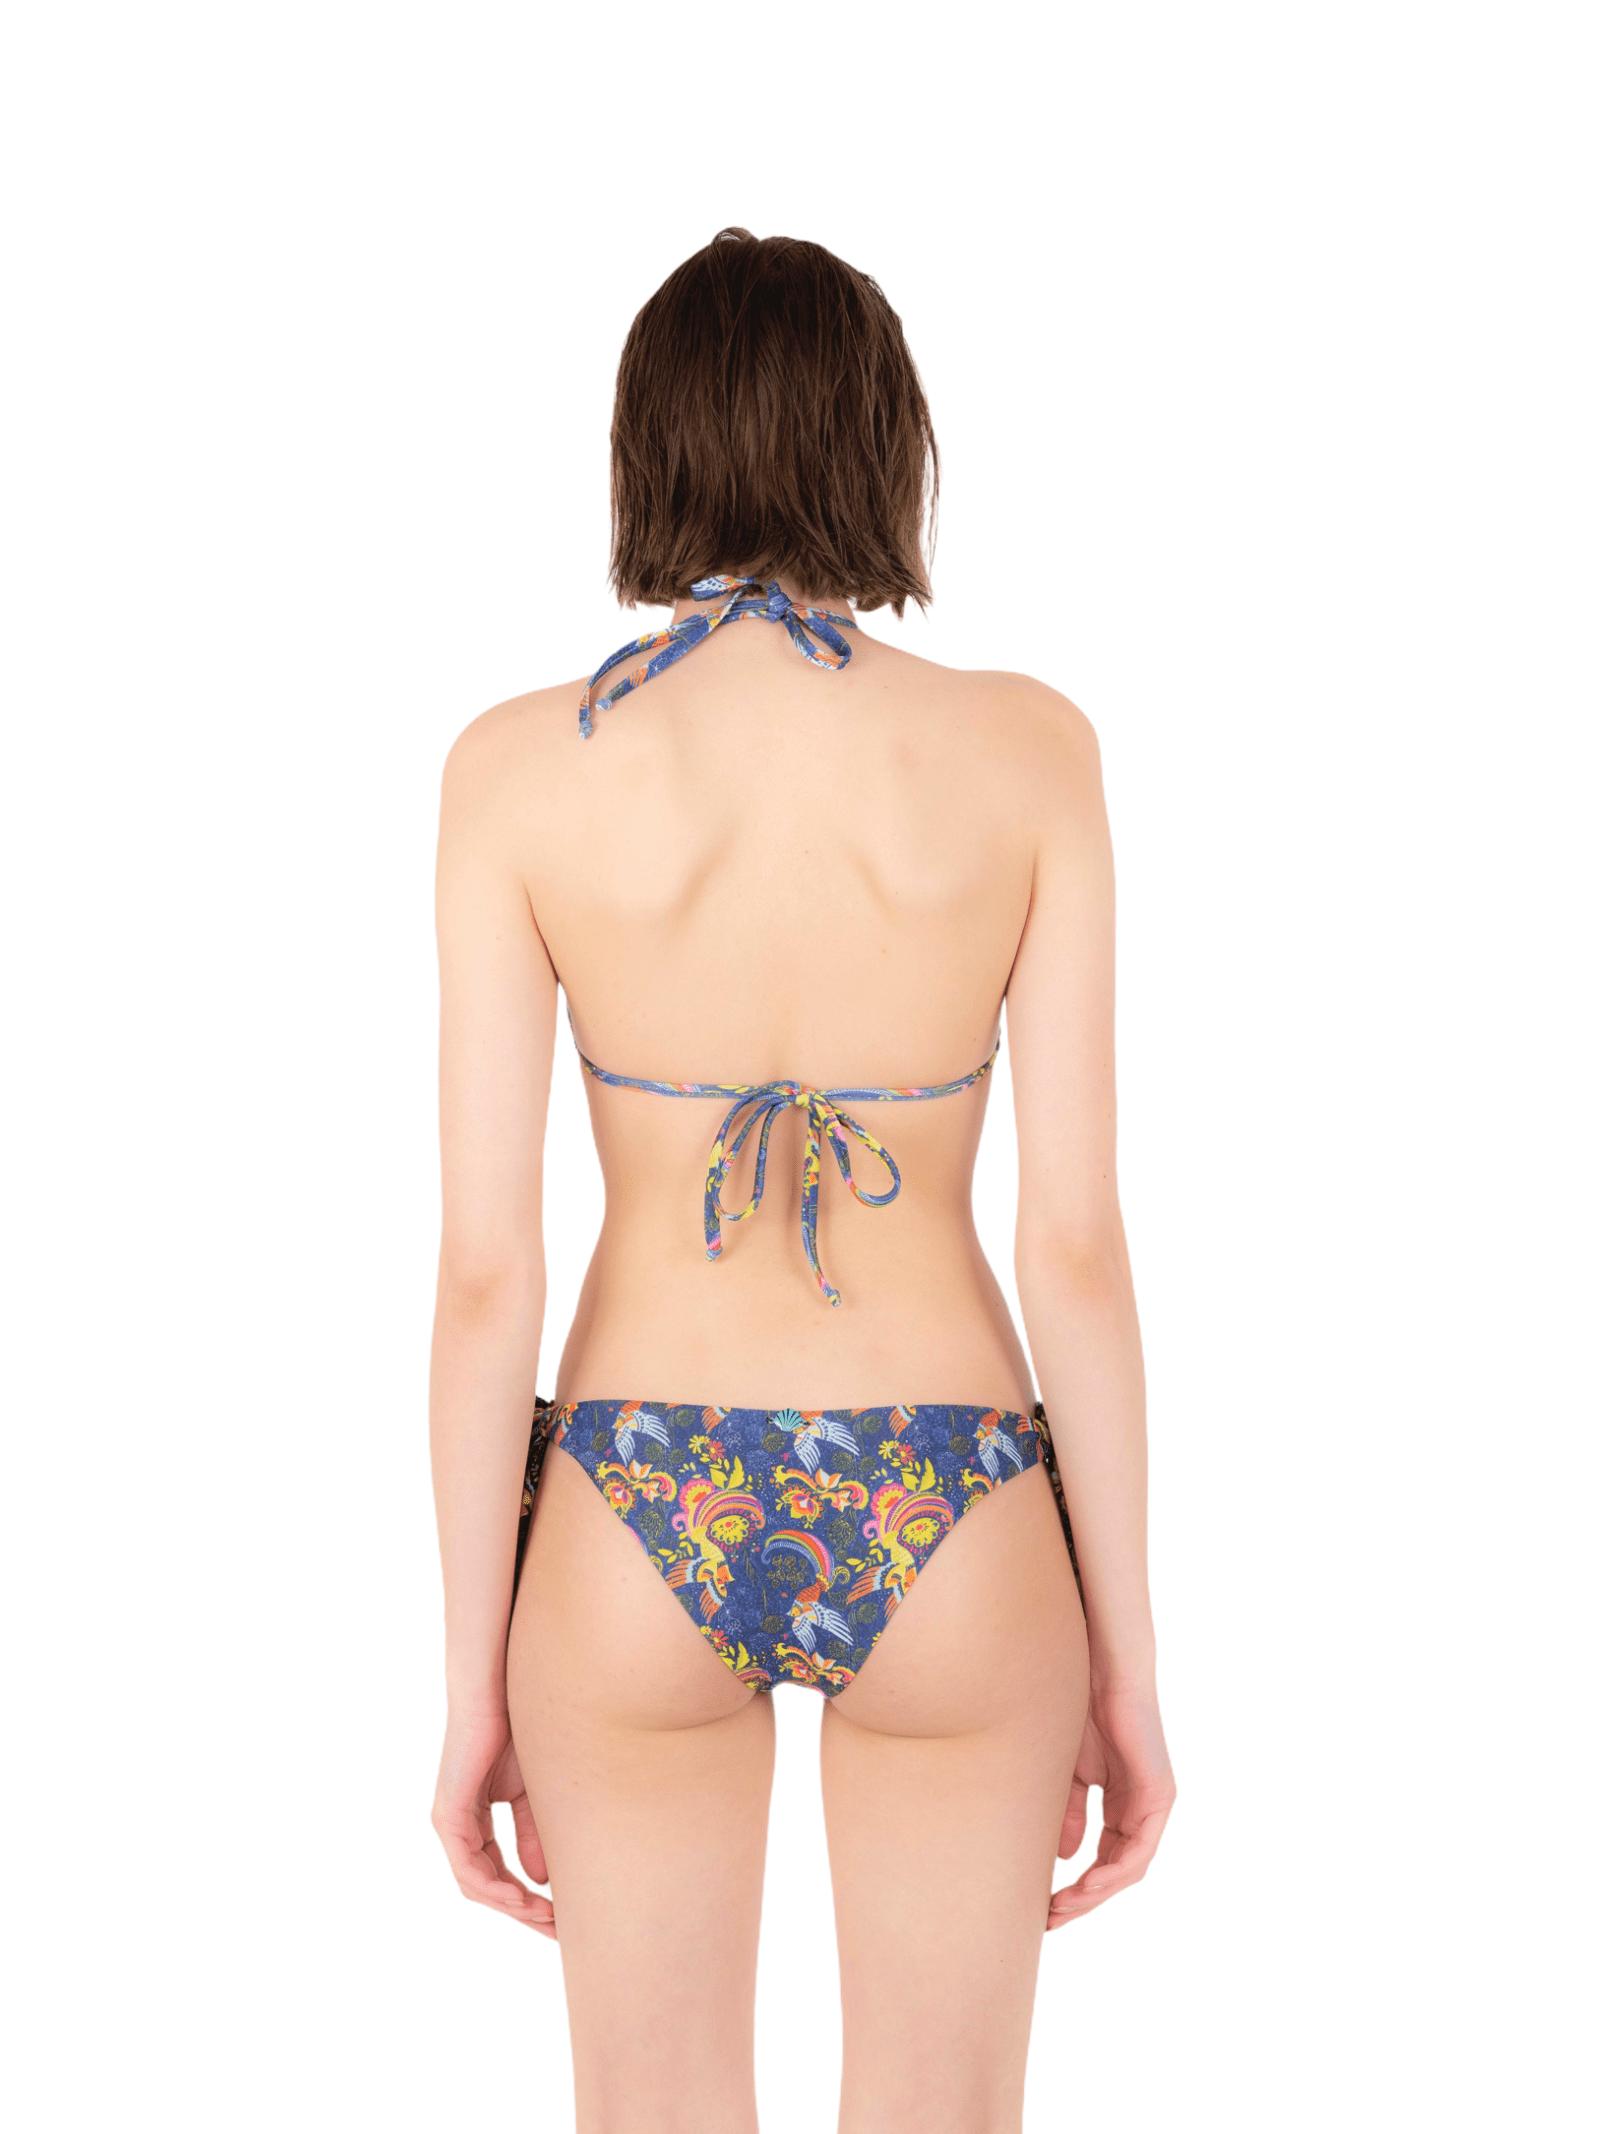 Bikini triangle with bow slip ANNAMARE | 23 | BK-117BLU